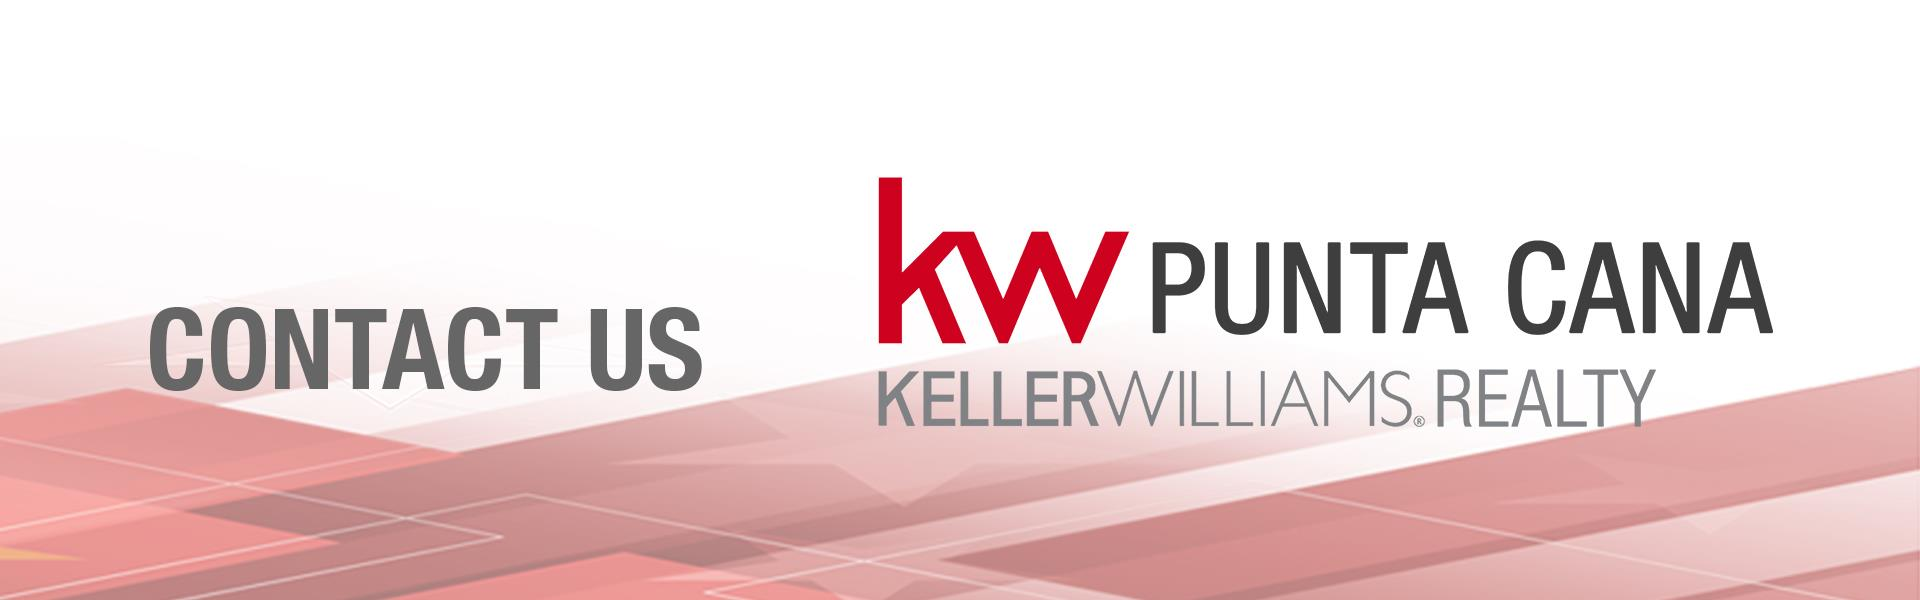 Feedback Keller Williams Punta Cana DR4Sale Bavaro Punta Cana Real Estate Dominican Republic